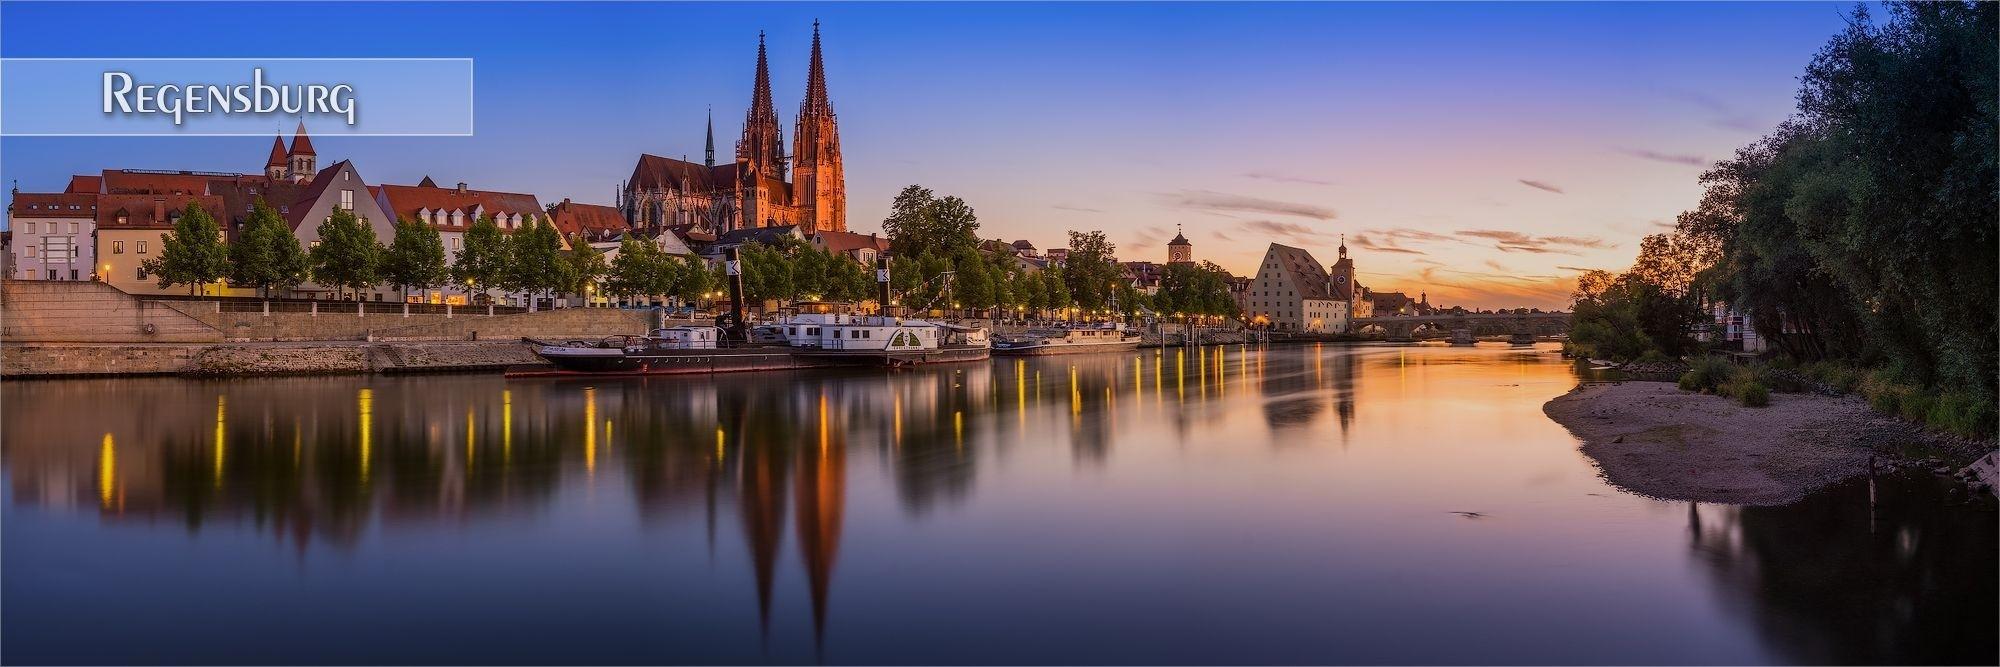 Fineart & Panoramafotografien aus Regensburg